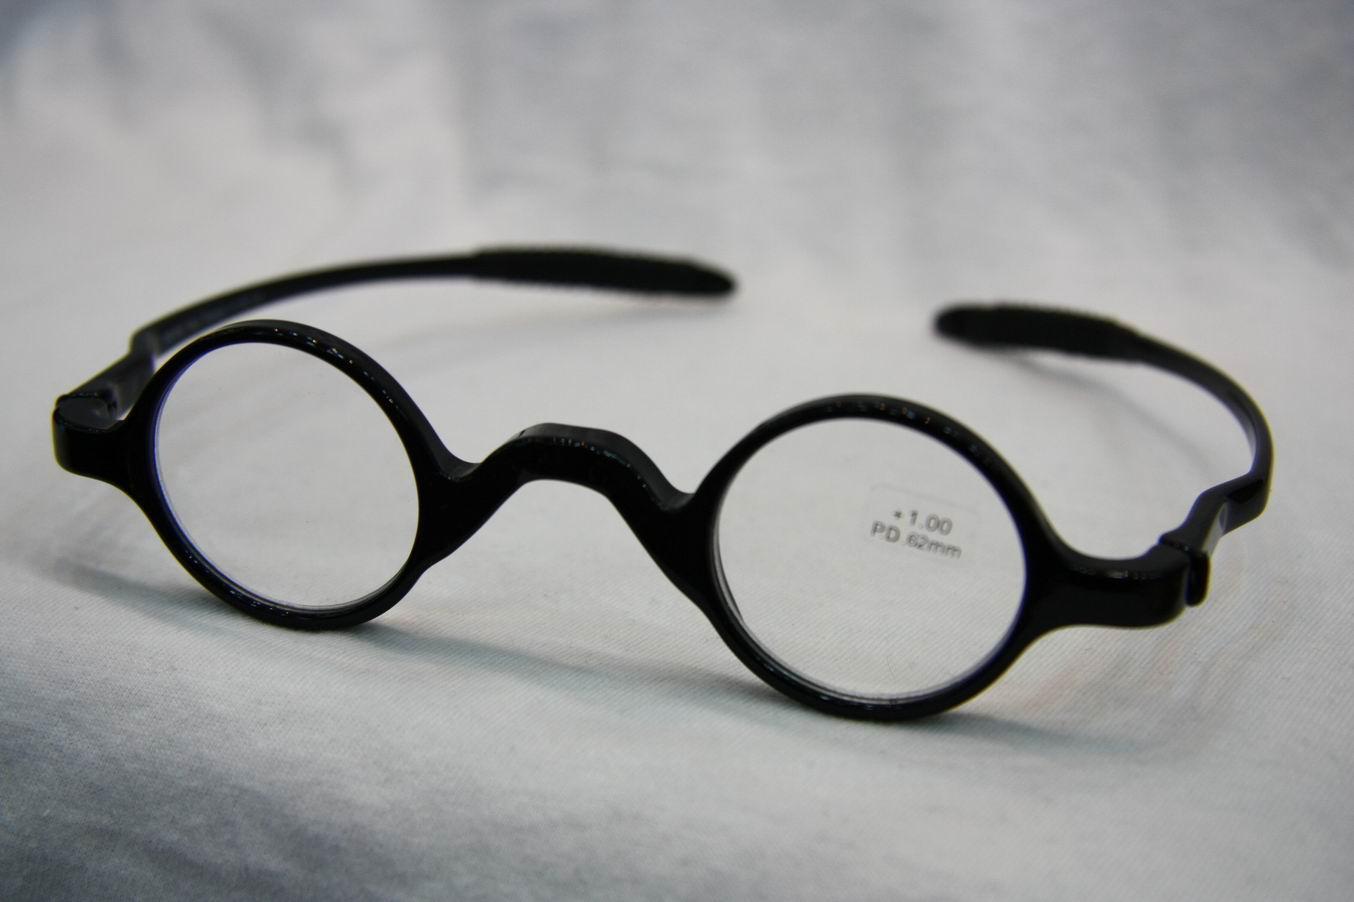 Classical Retro Round Frame Reading Glasses, Men Women Flexible ...